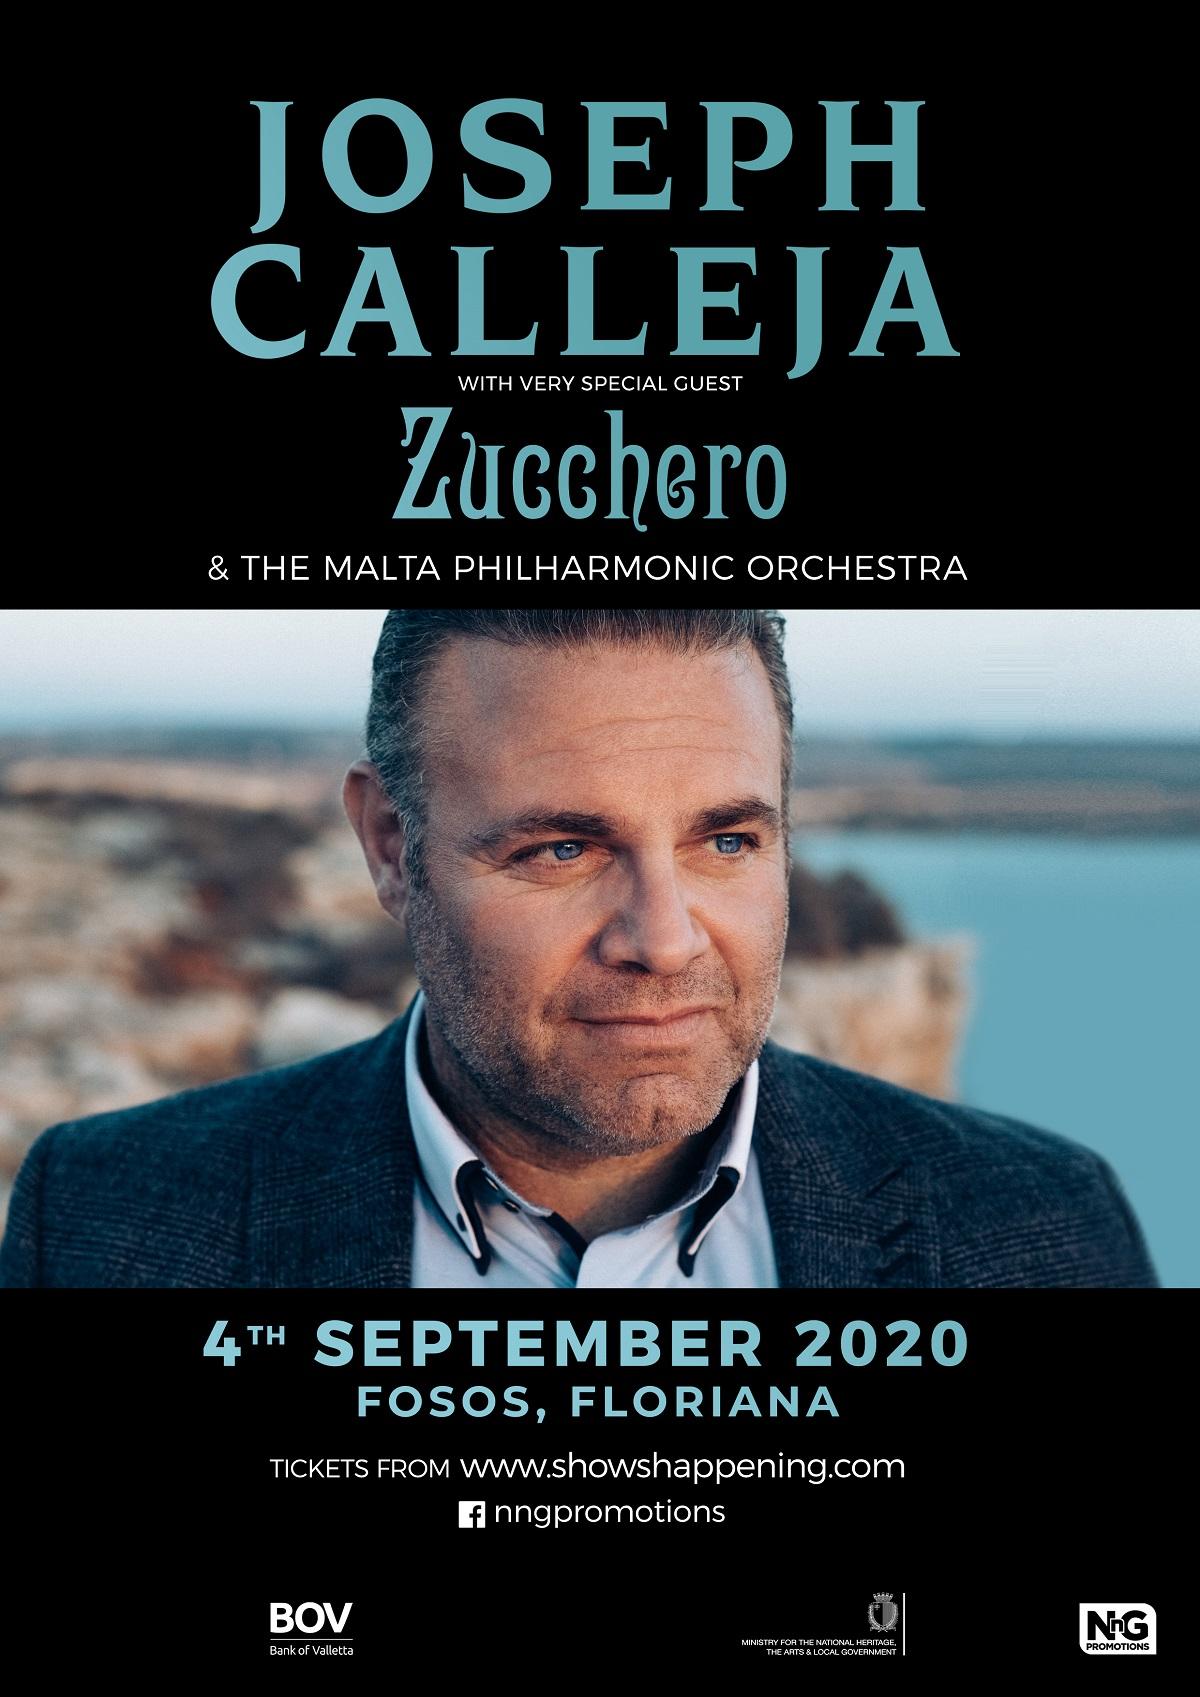 Joseph Calleja 2020 flyer